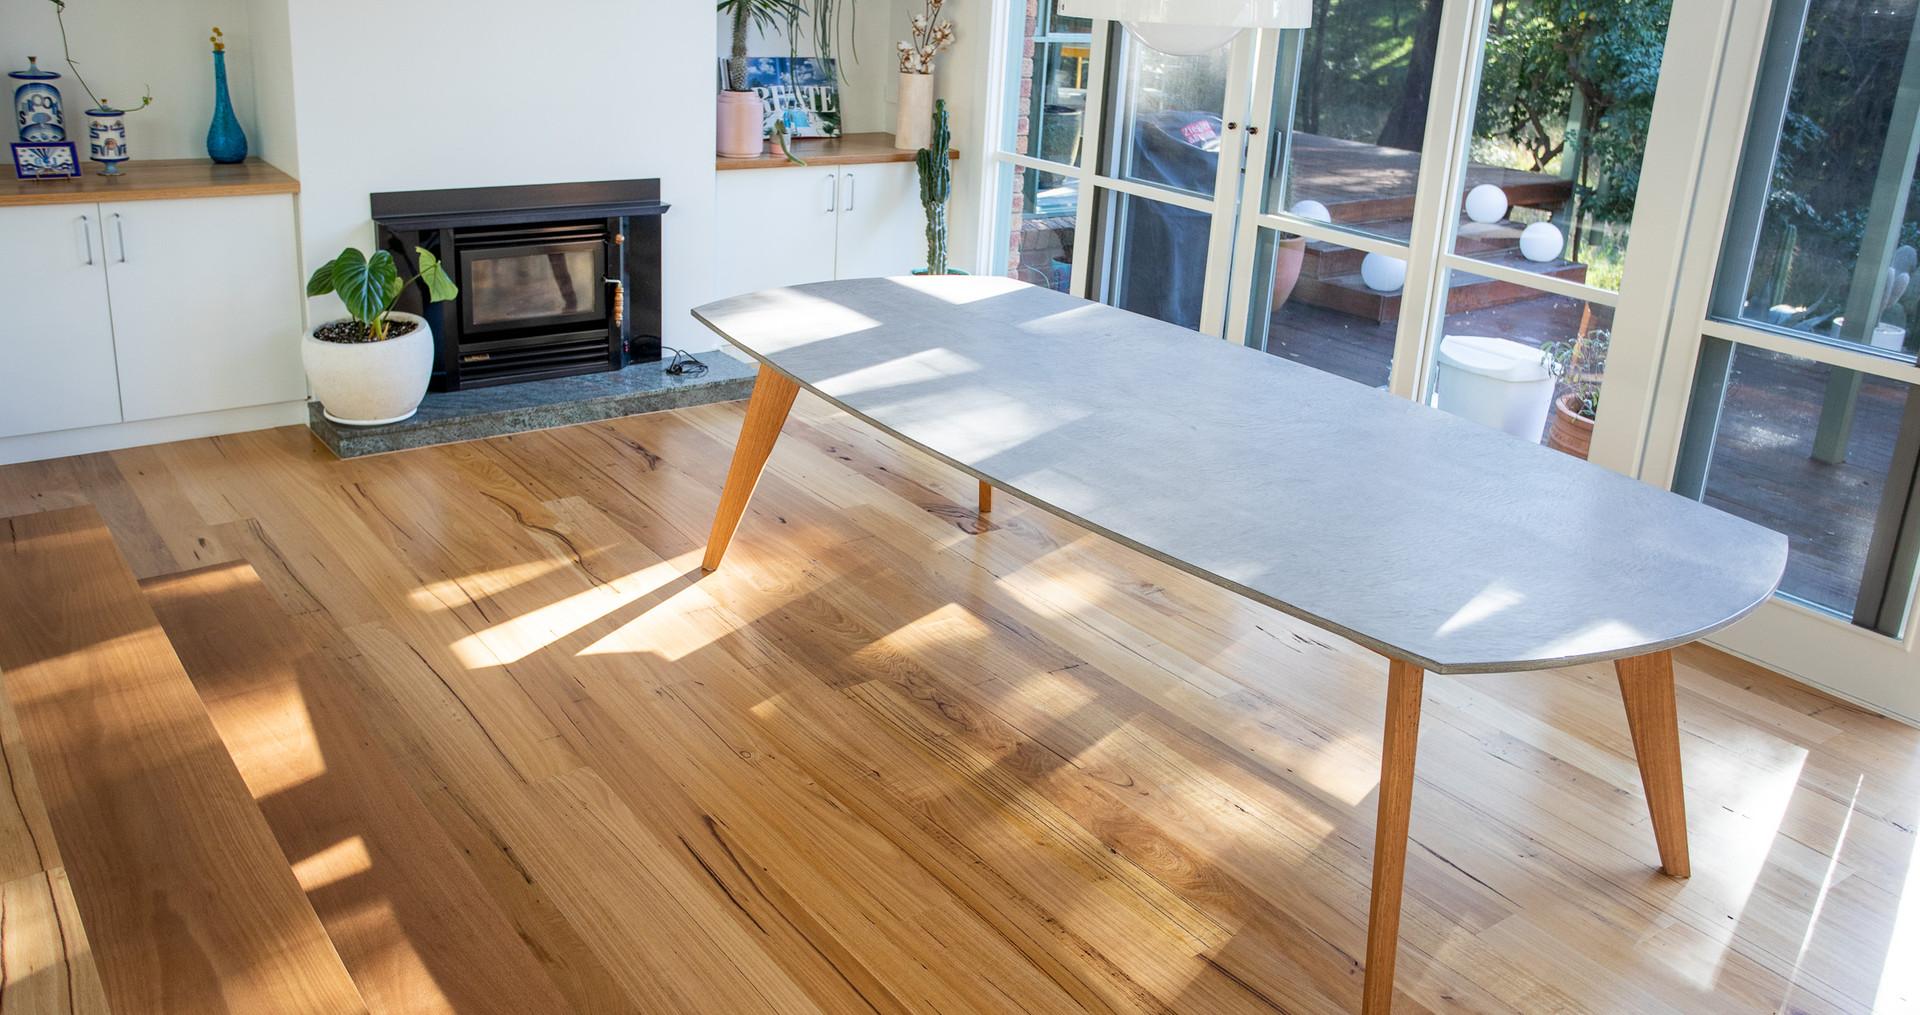 Custom Concrete Dining Table - Jan Juc